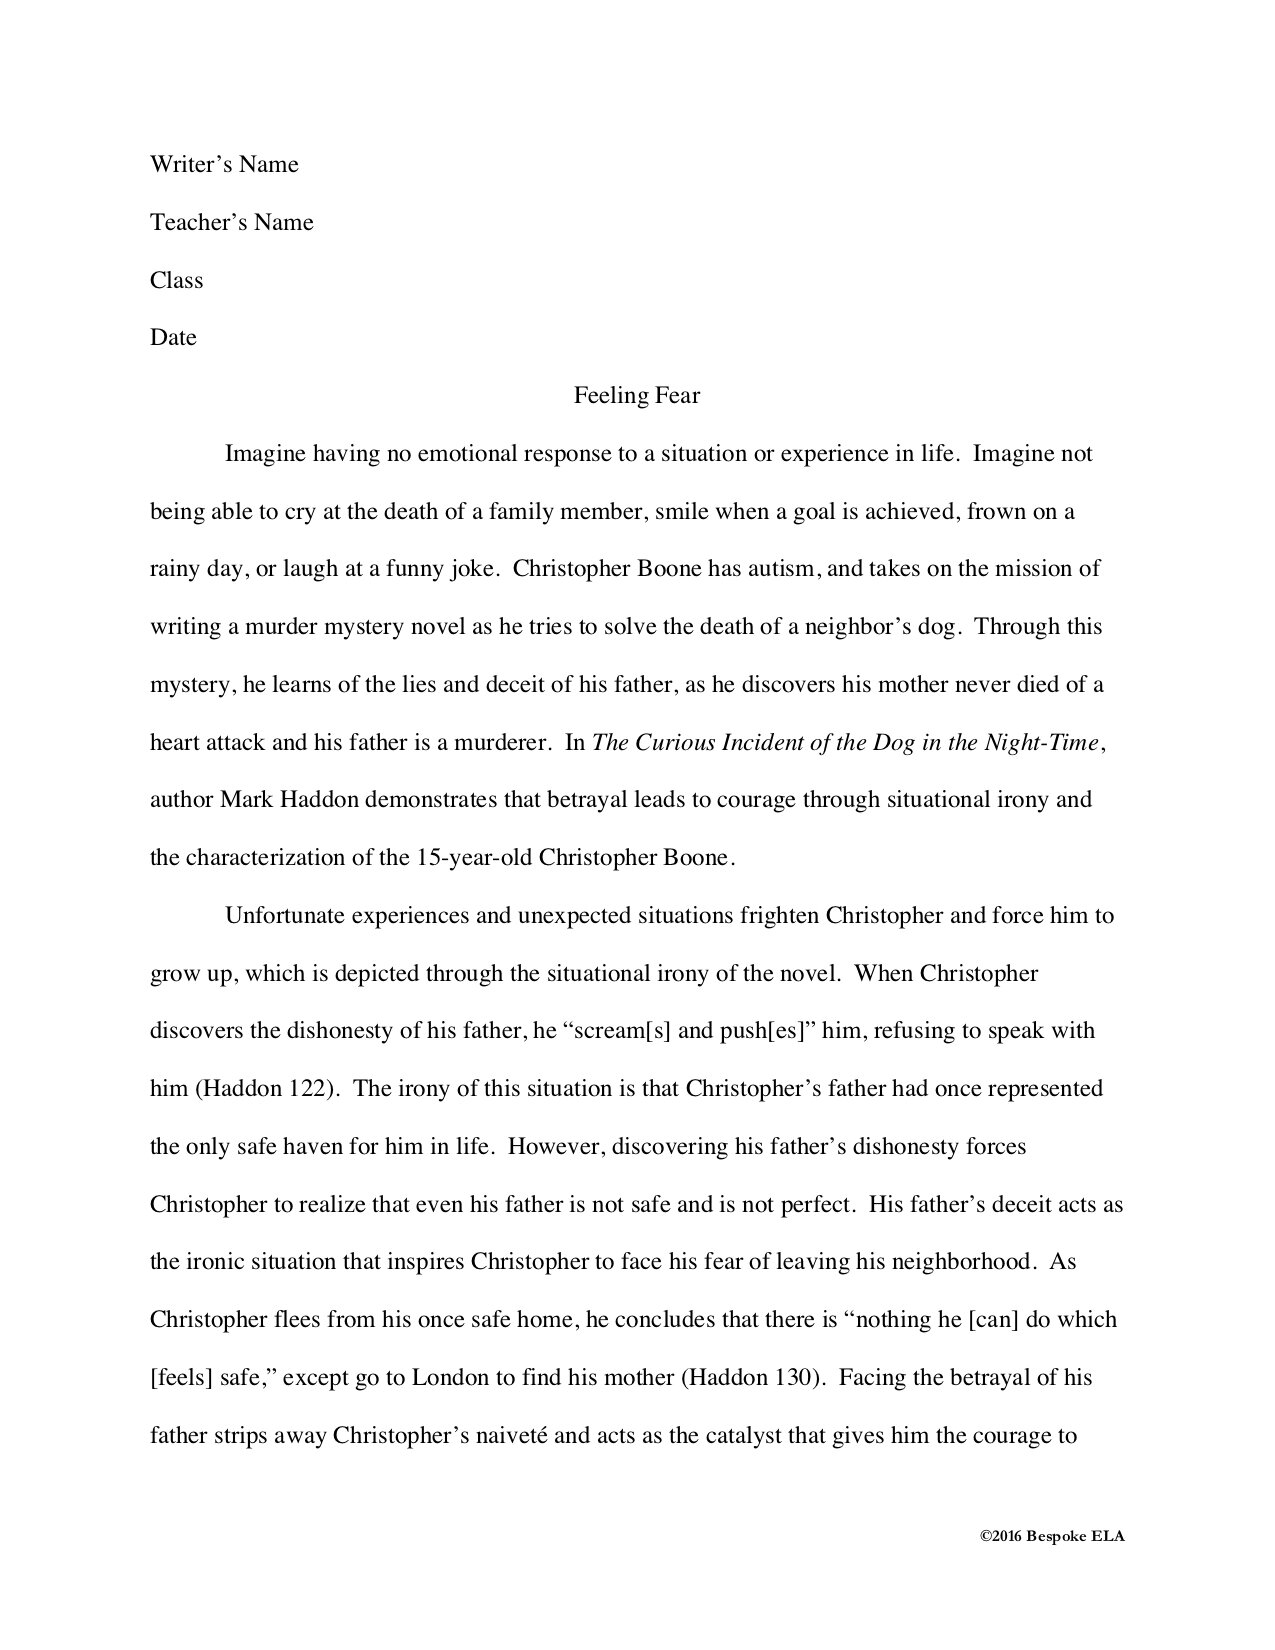 Literary argument essay website writes essays for you